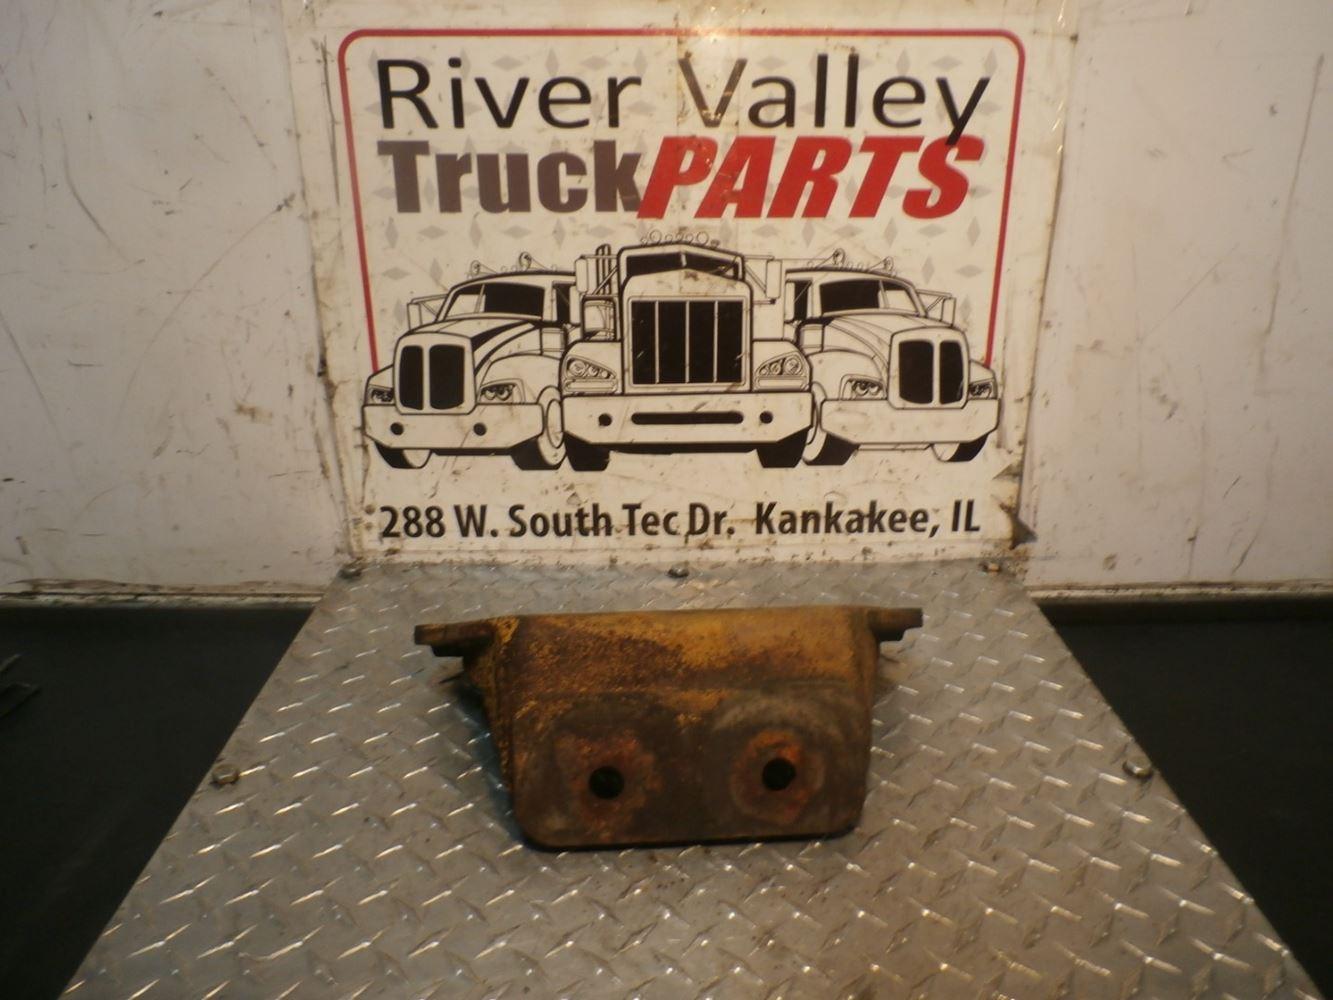 peterbilt 377 fuse box used truck parts freightliner international peterbilt  used truck parts freightliner